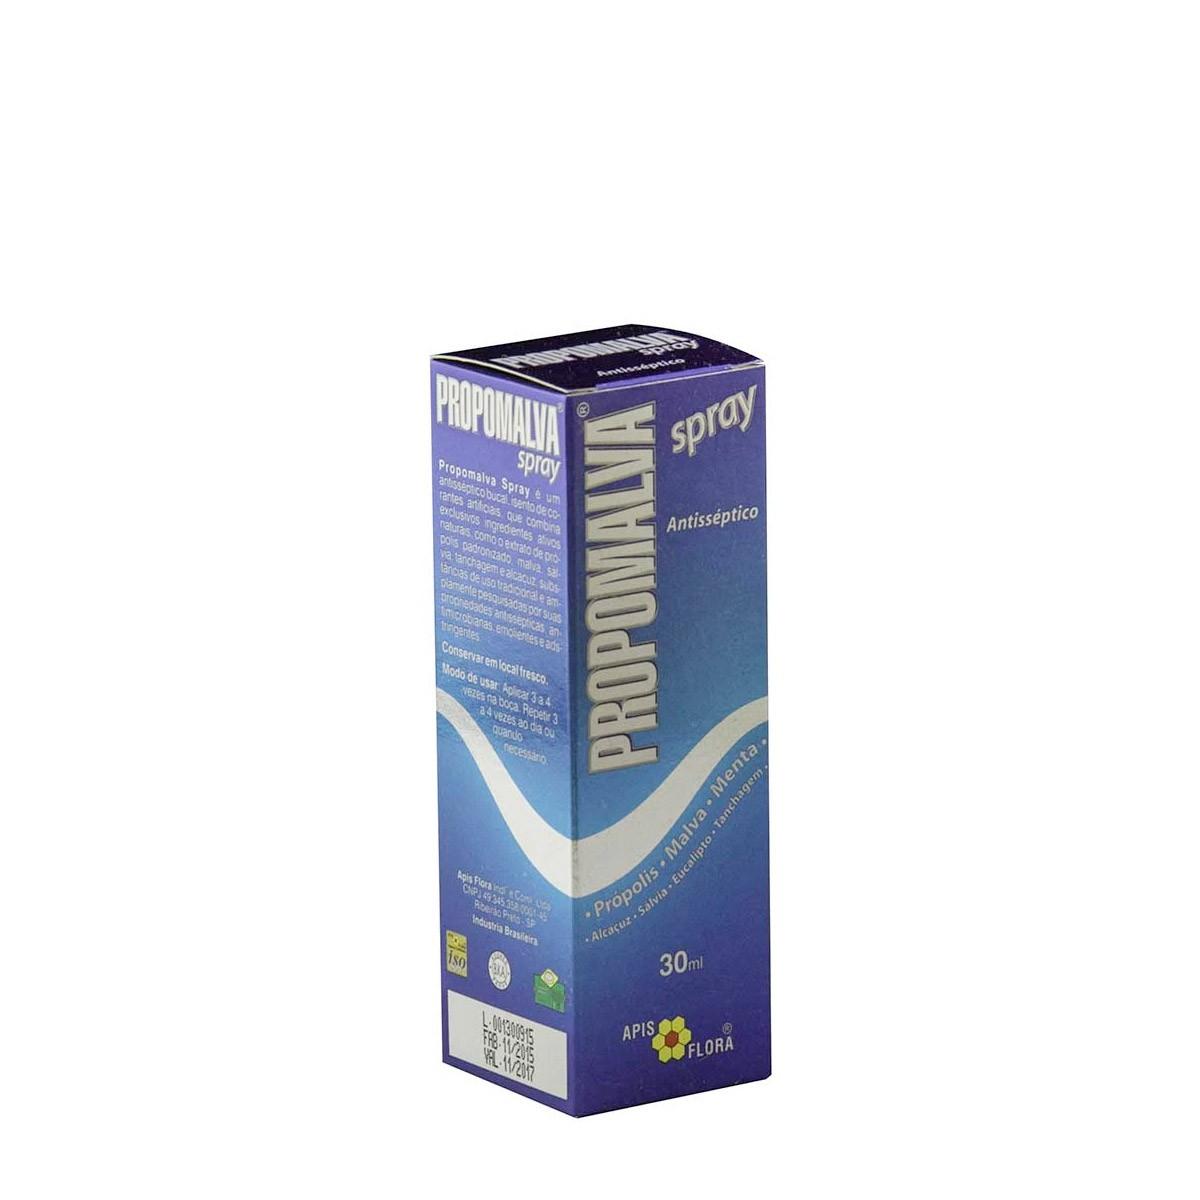 Propomalva Própolis Spray